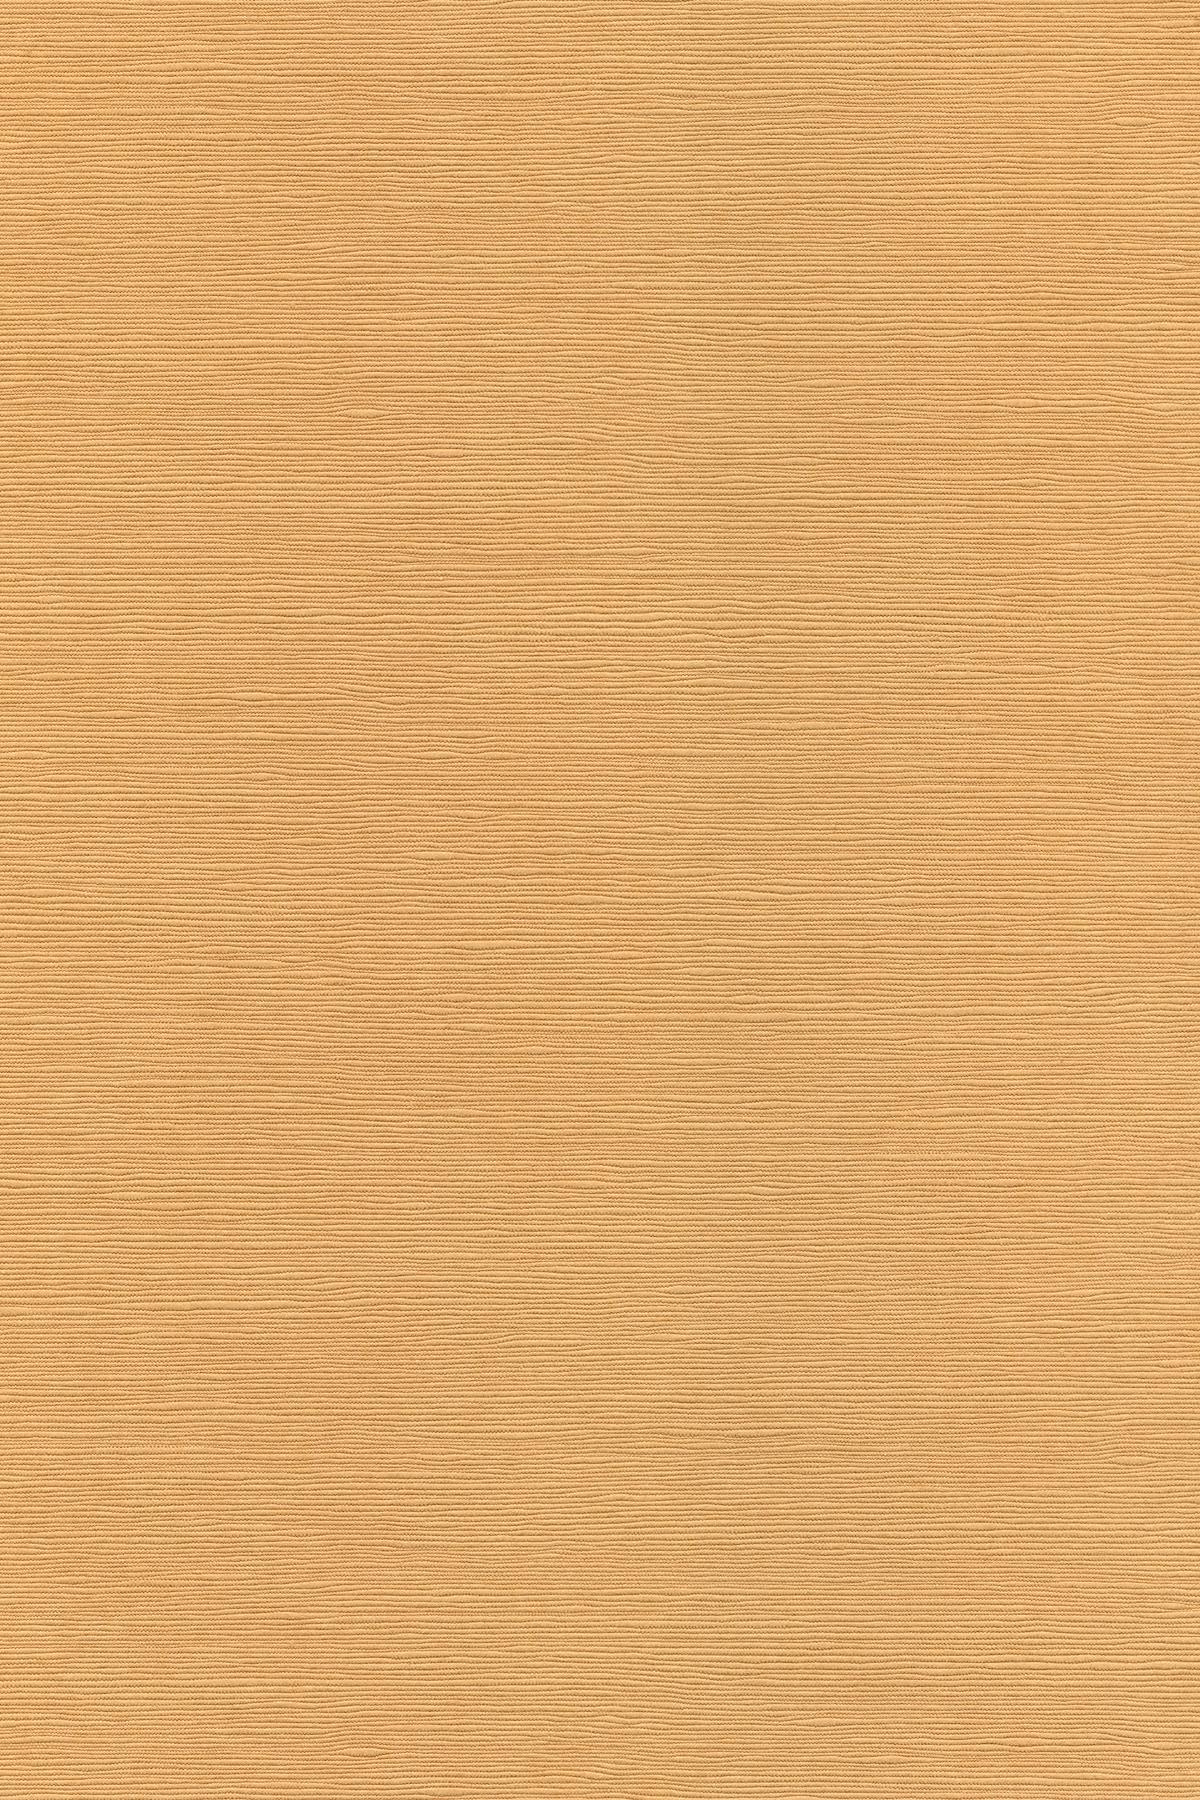 Japanese linen paper - tan beige photo